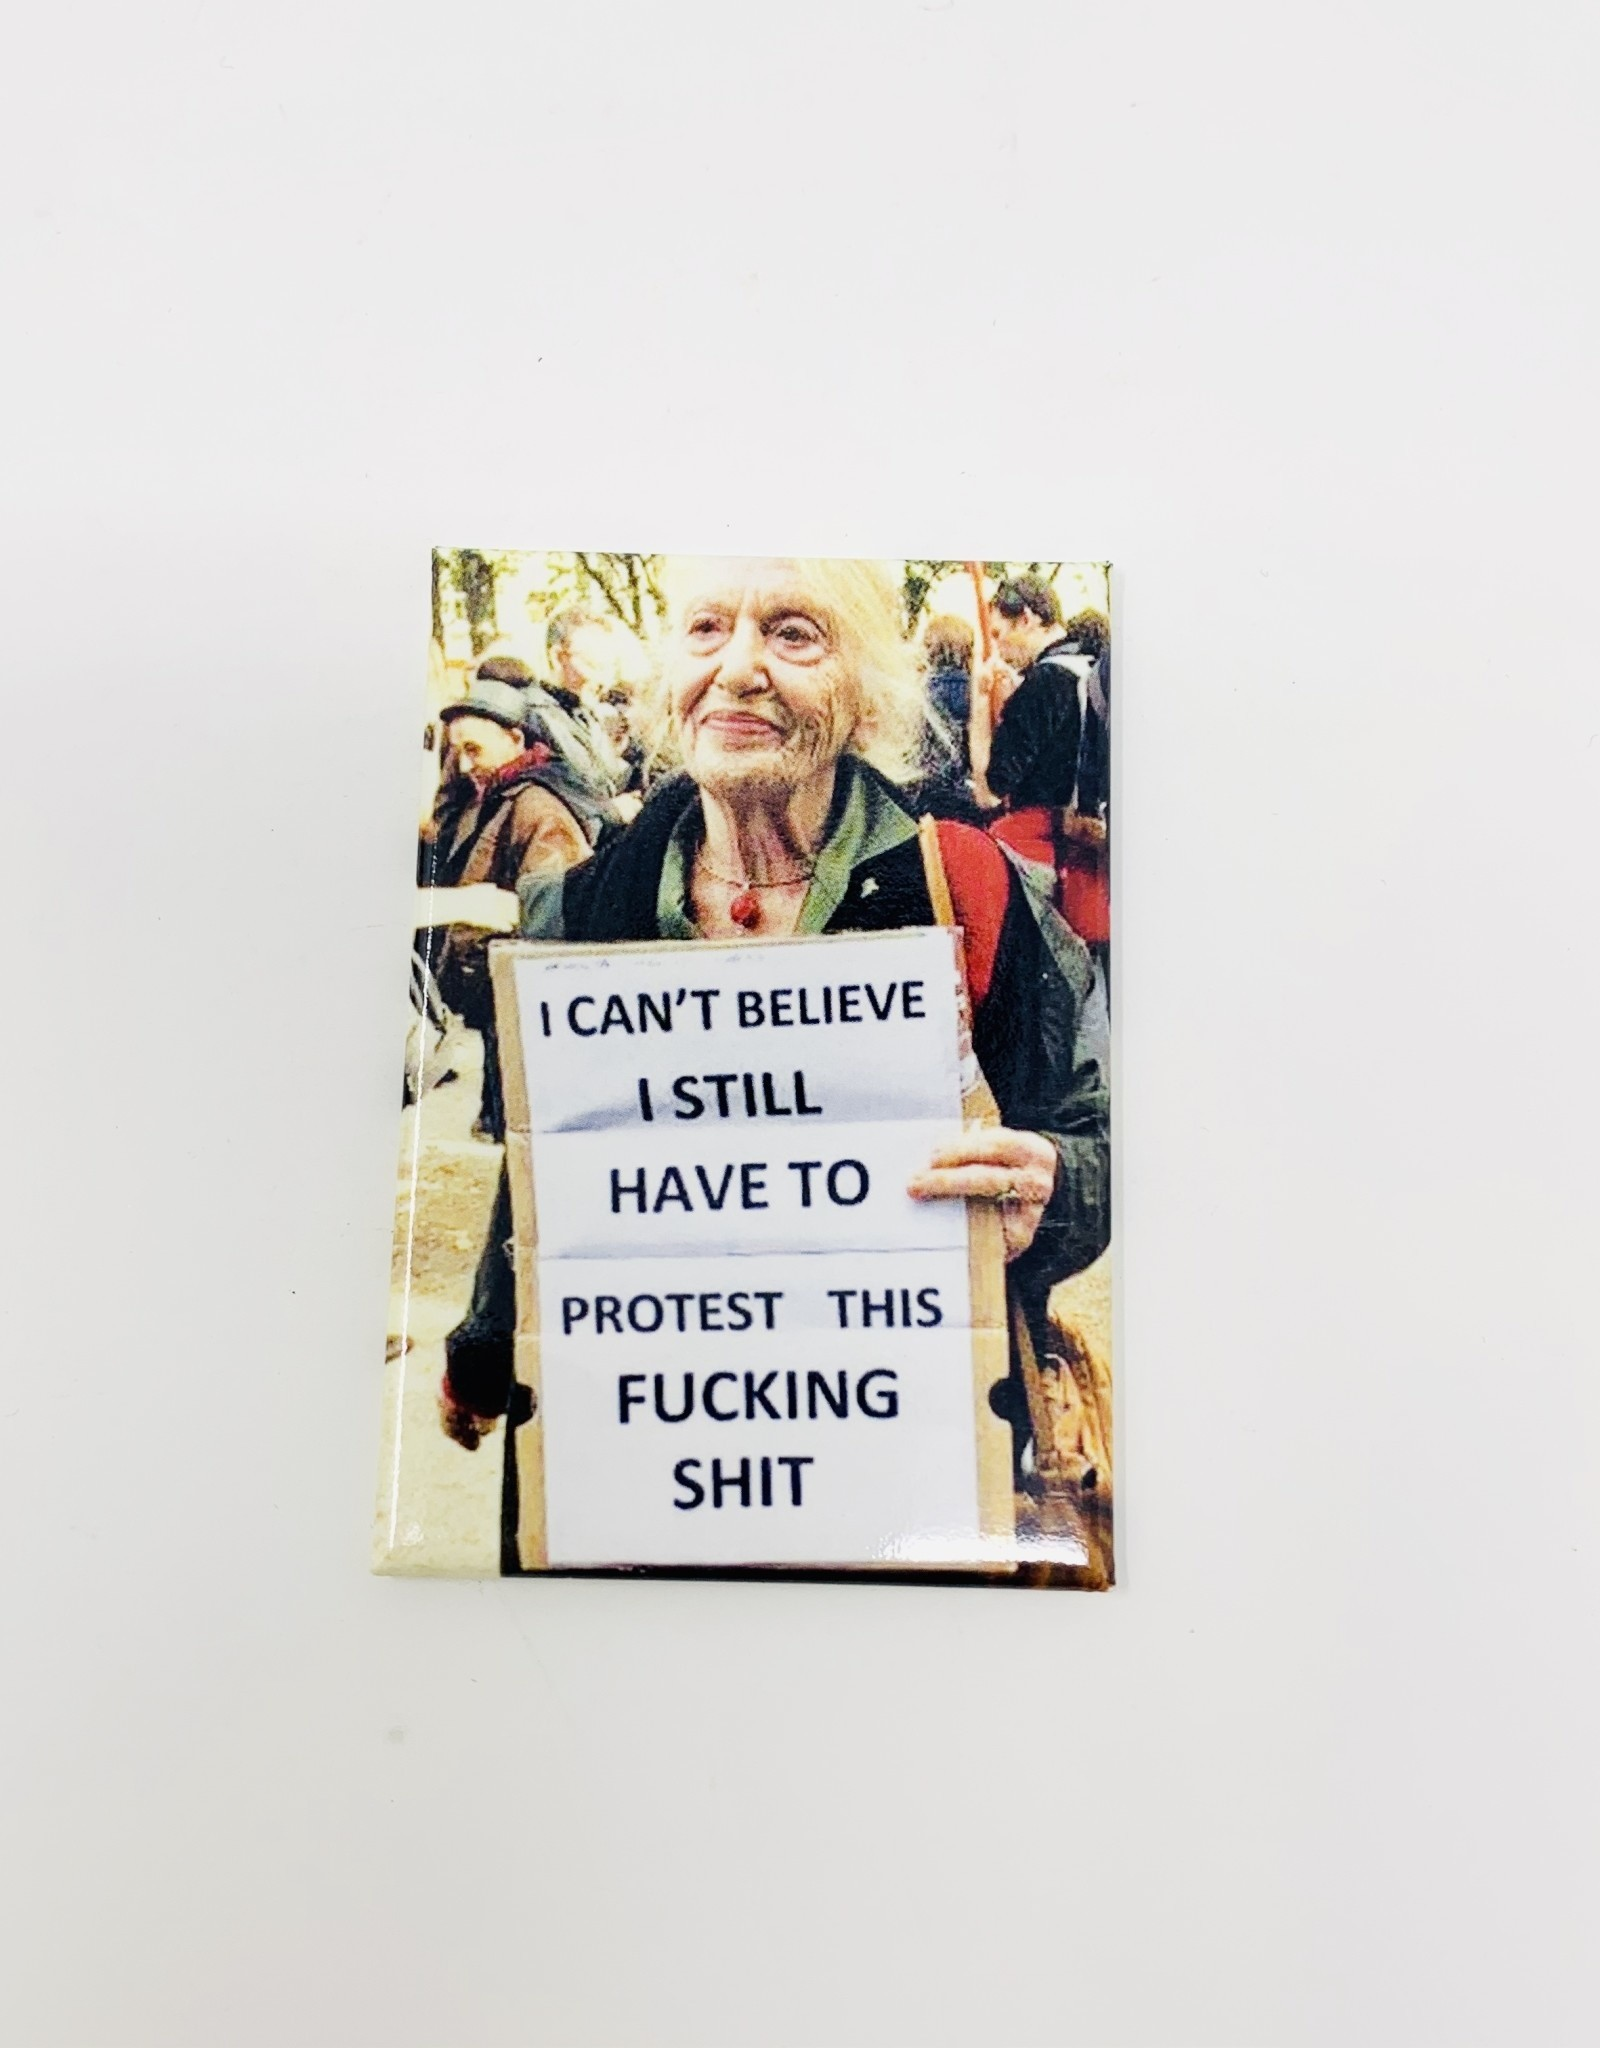 Ephemera Protest this fucking shit magnet